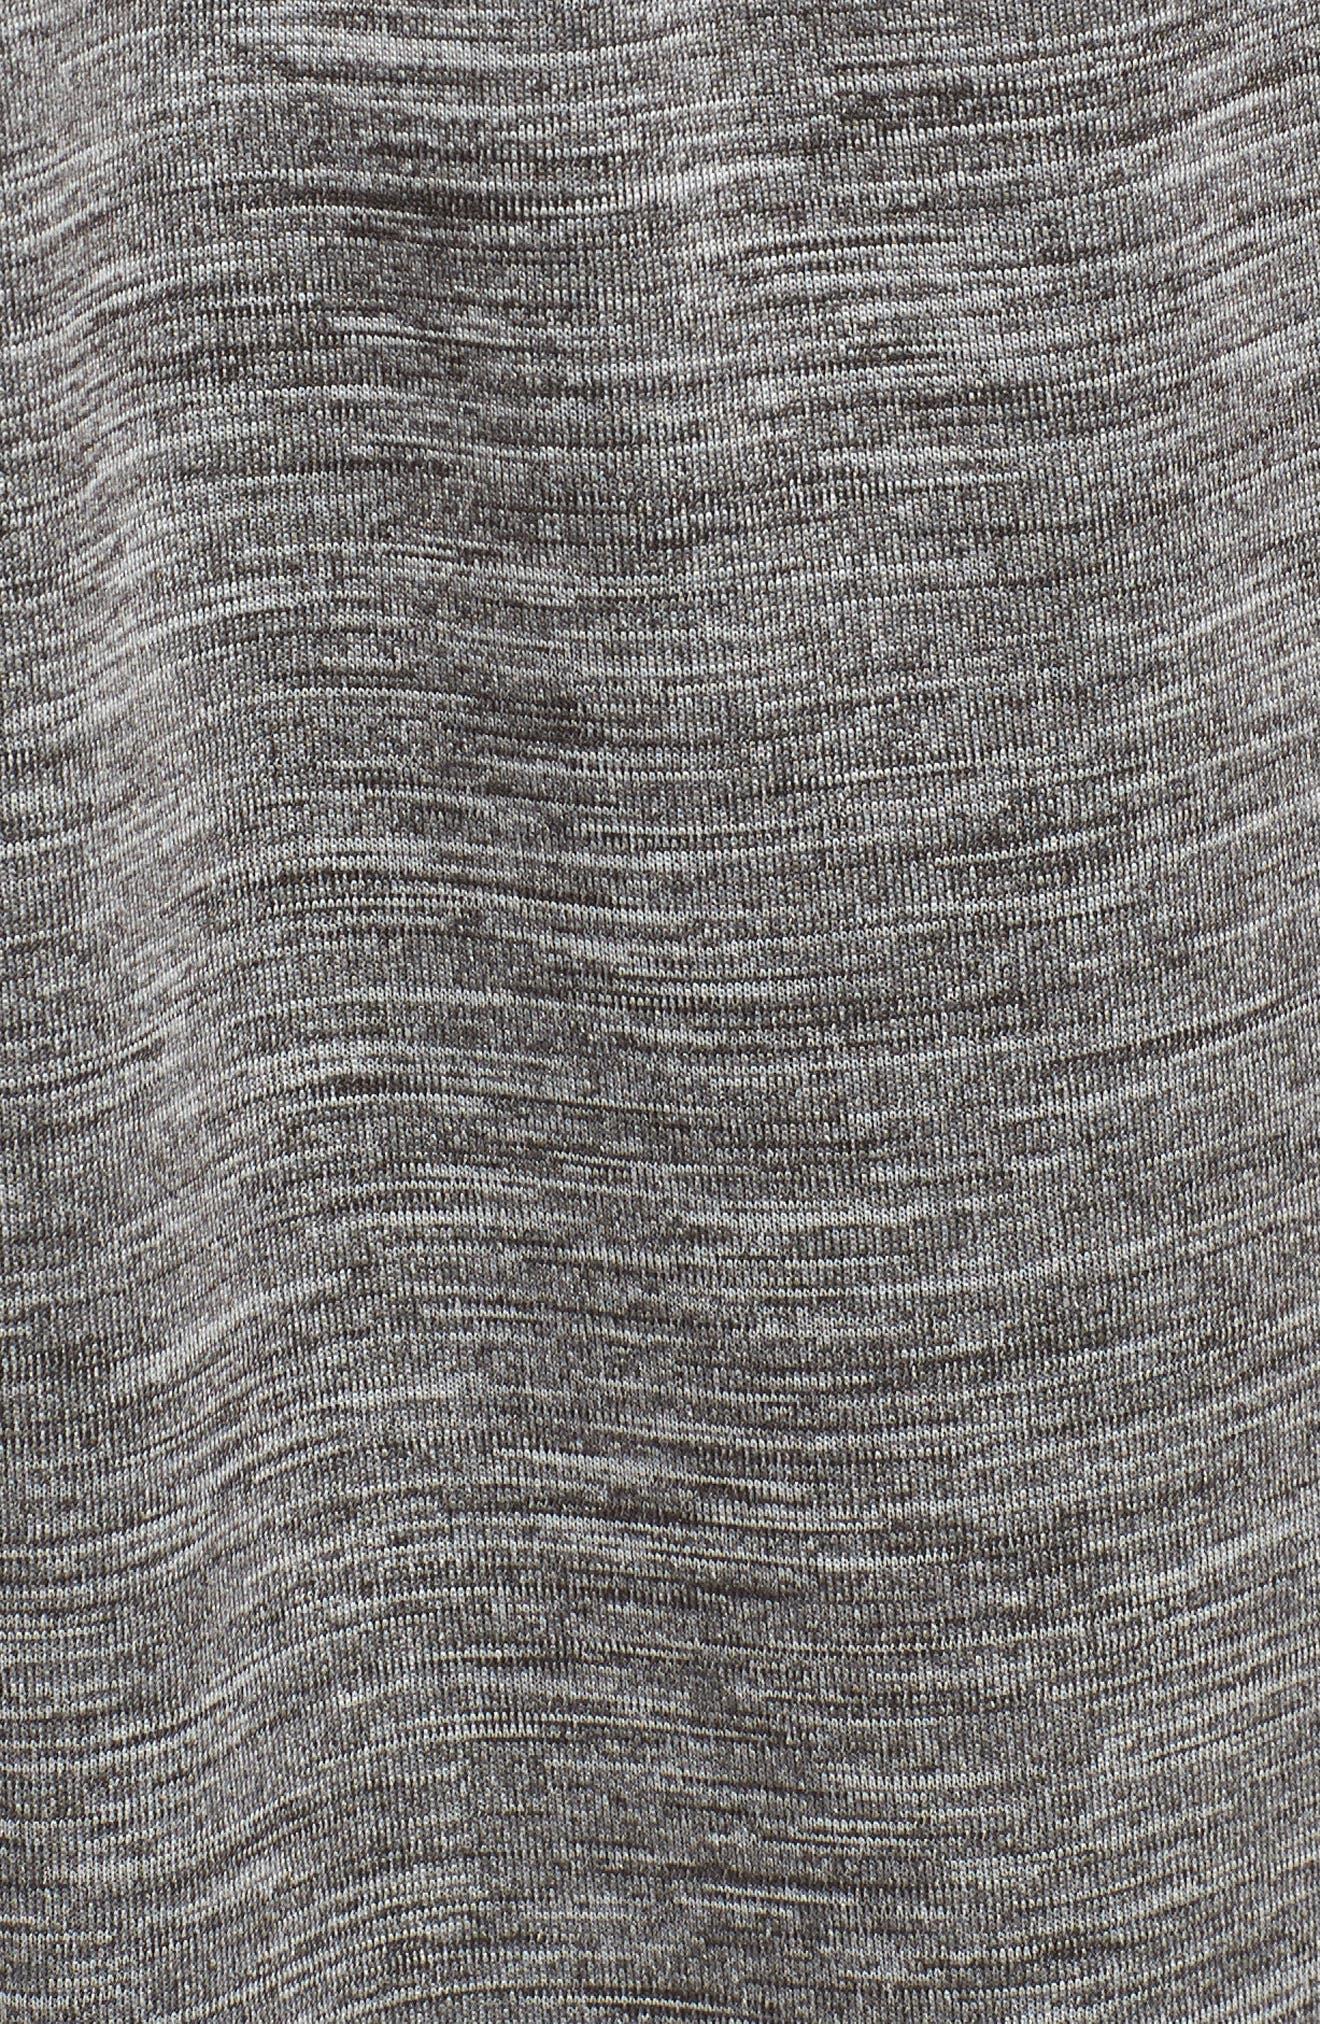 ADIDAS,                             Z.N.E. Lounge Pants,                             Alternate thumbnail 5, color,                             001